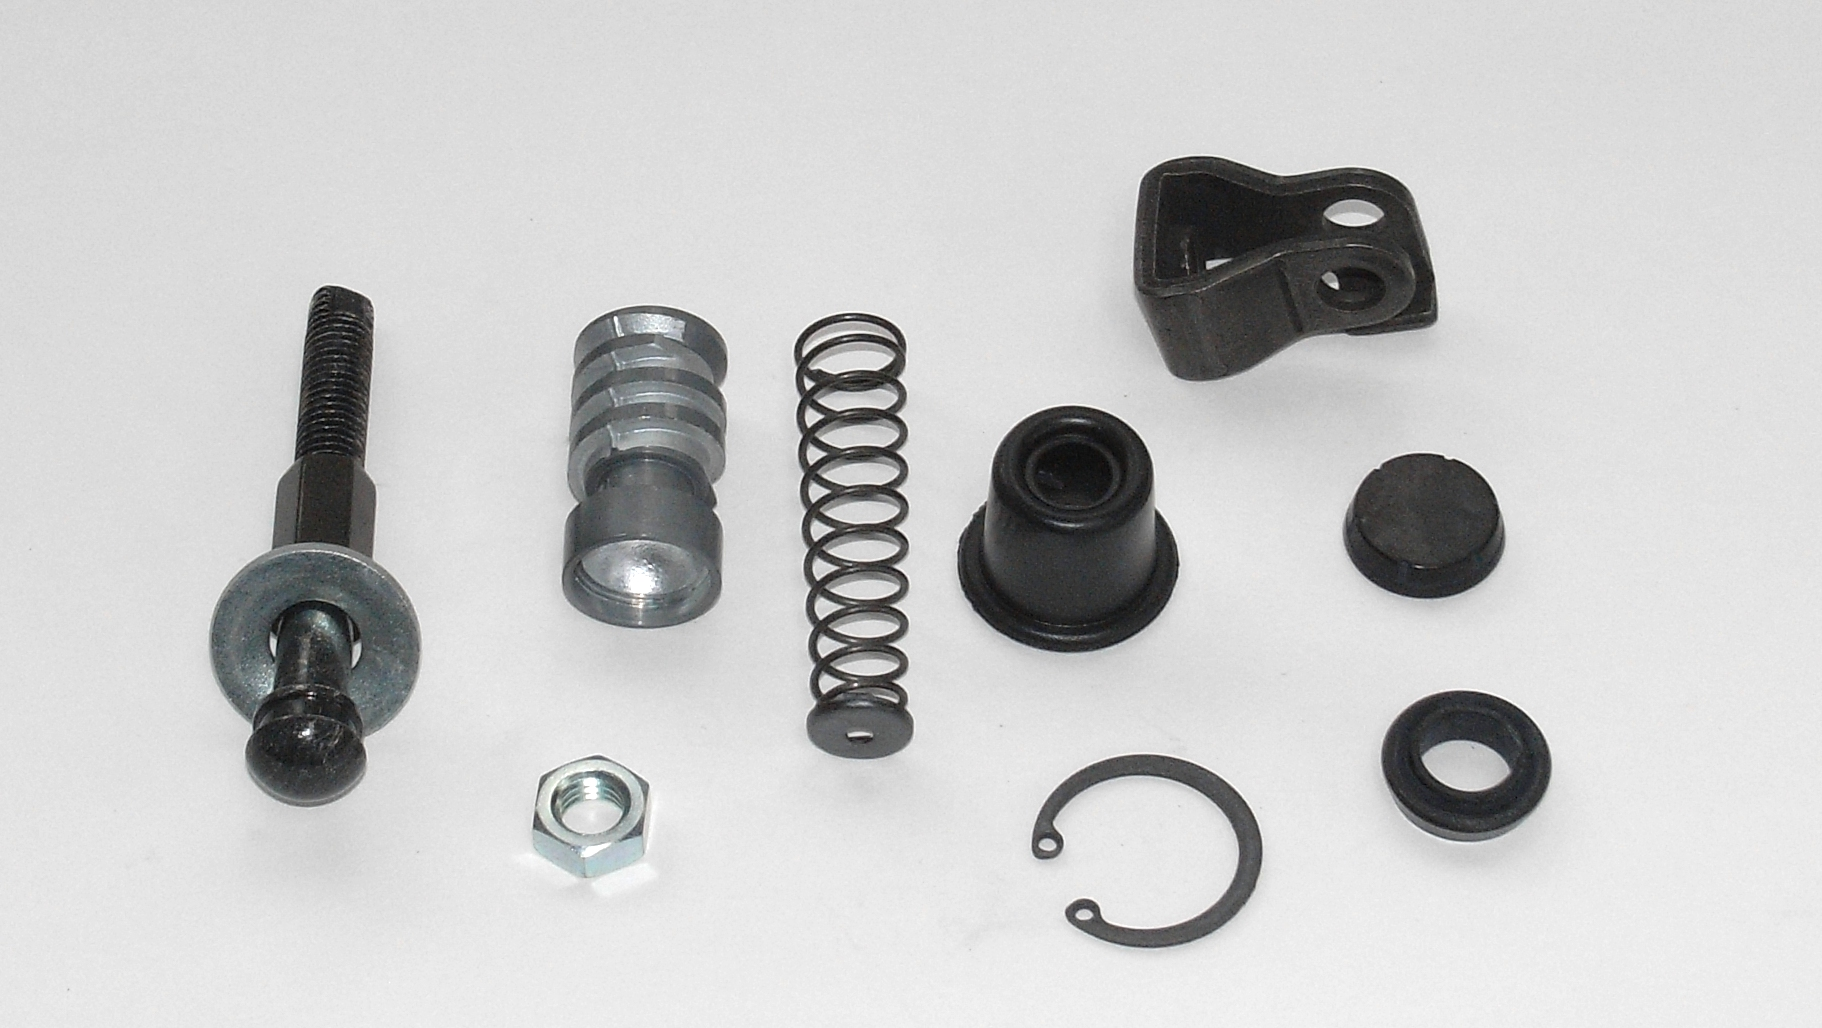 Kit réparation Maître Cylindre frein Arrière MSR-101 HONDA CB900F BOL D OR 81-82